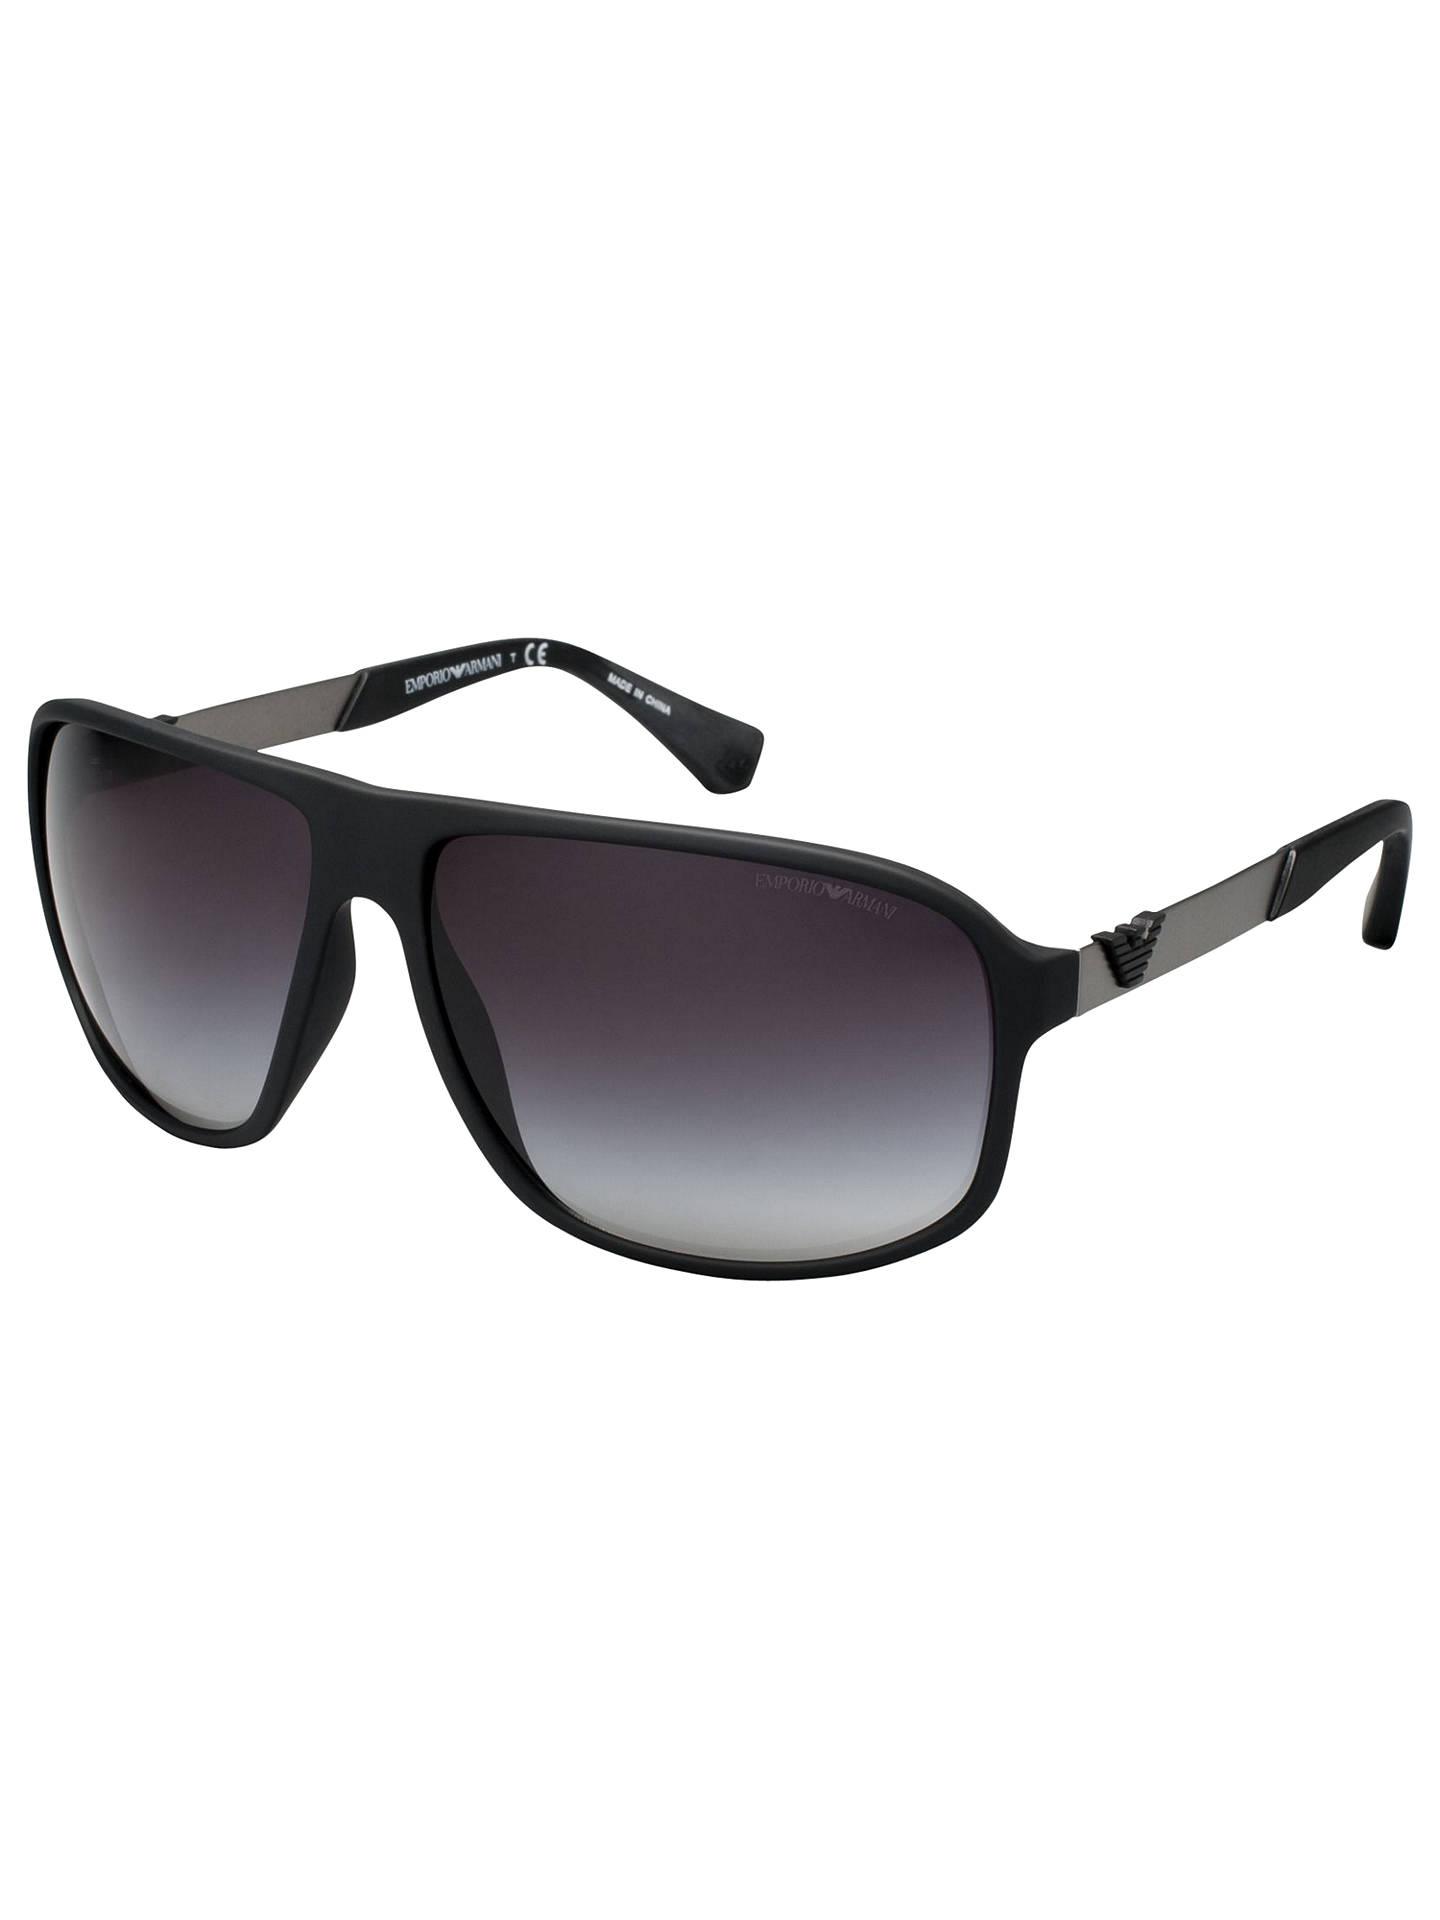 77c5b2382c7 Emporio Armani EA4029 Square Sunglasses at John Lewis   Partners